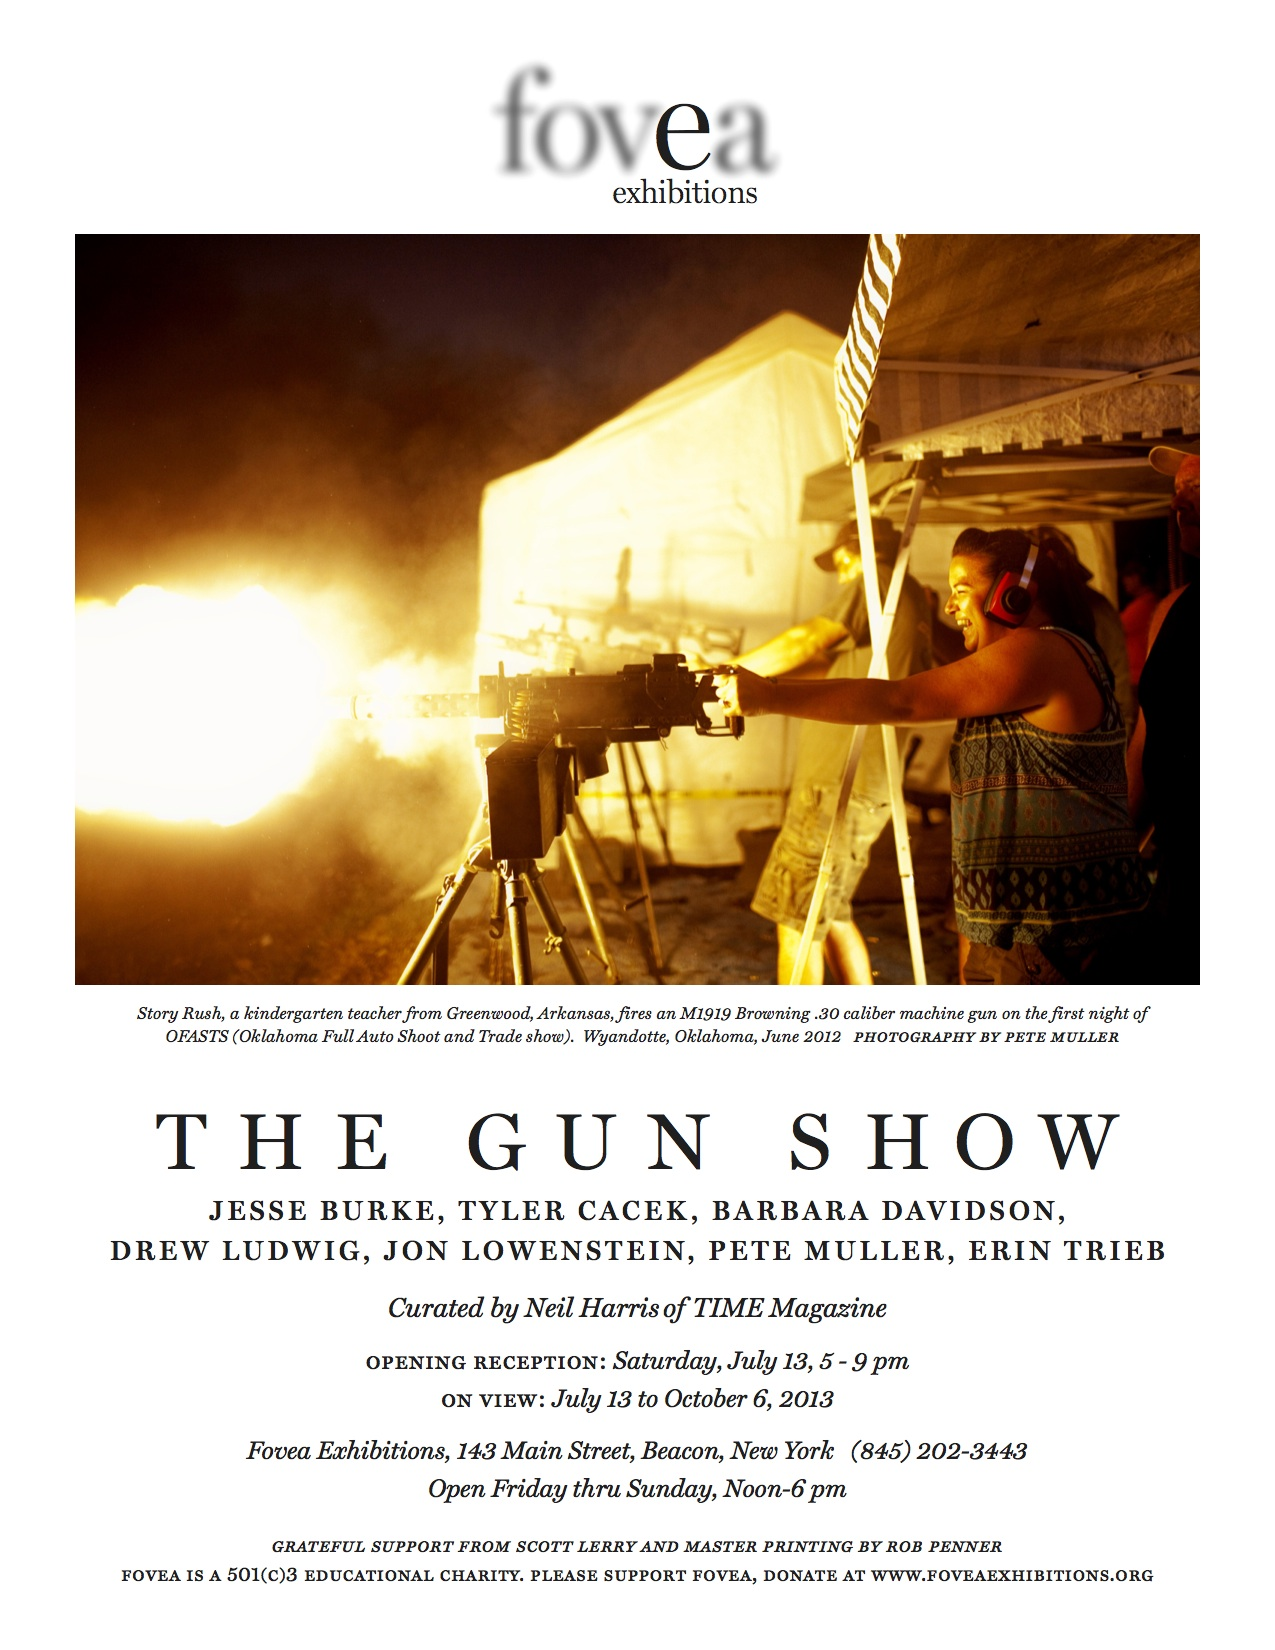 gun_show_2_copy